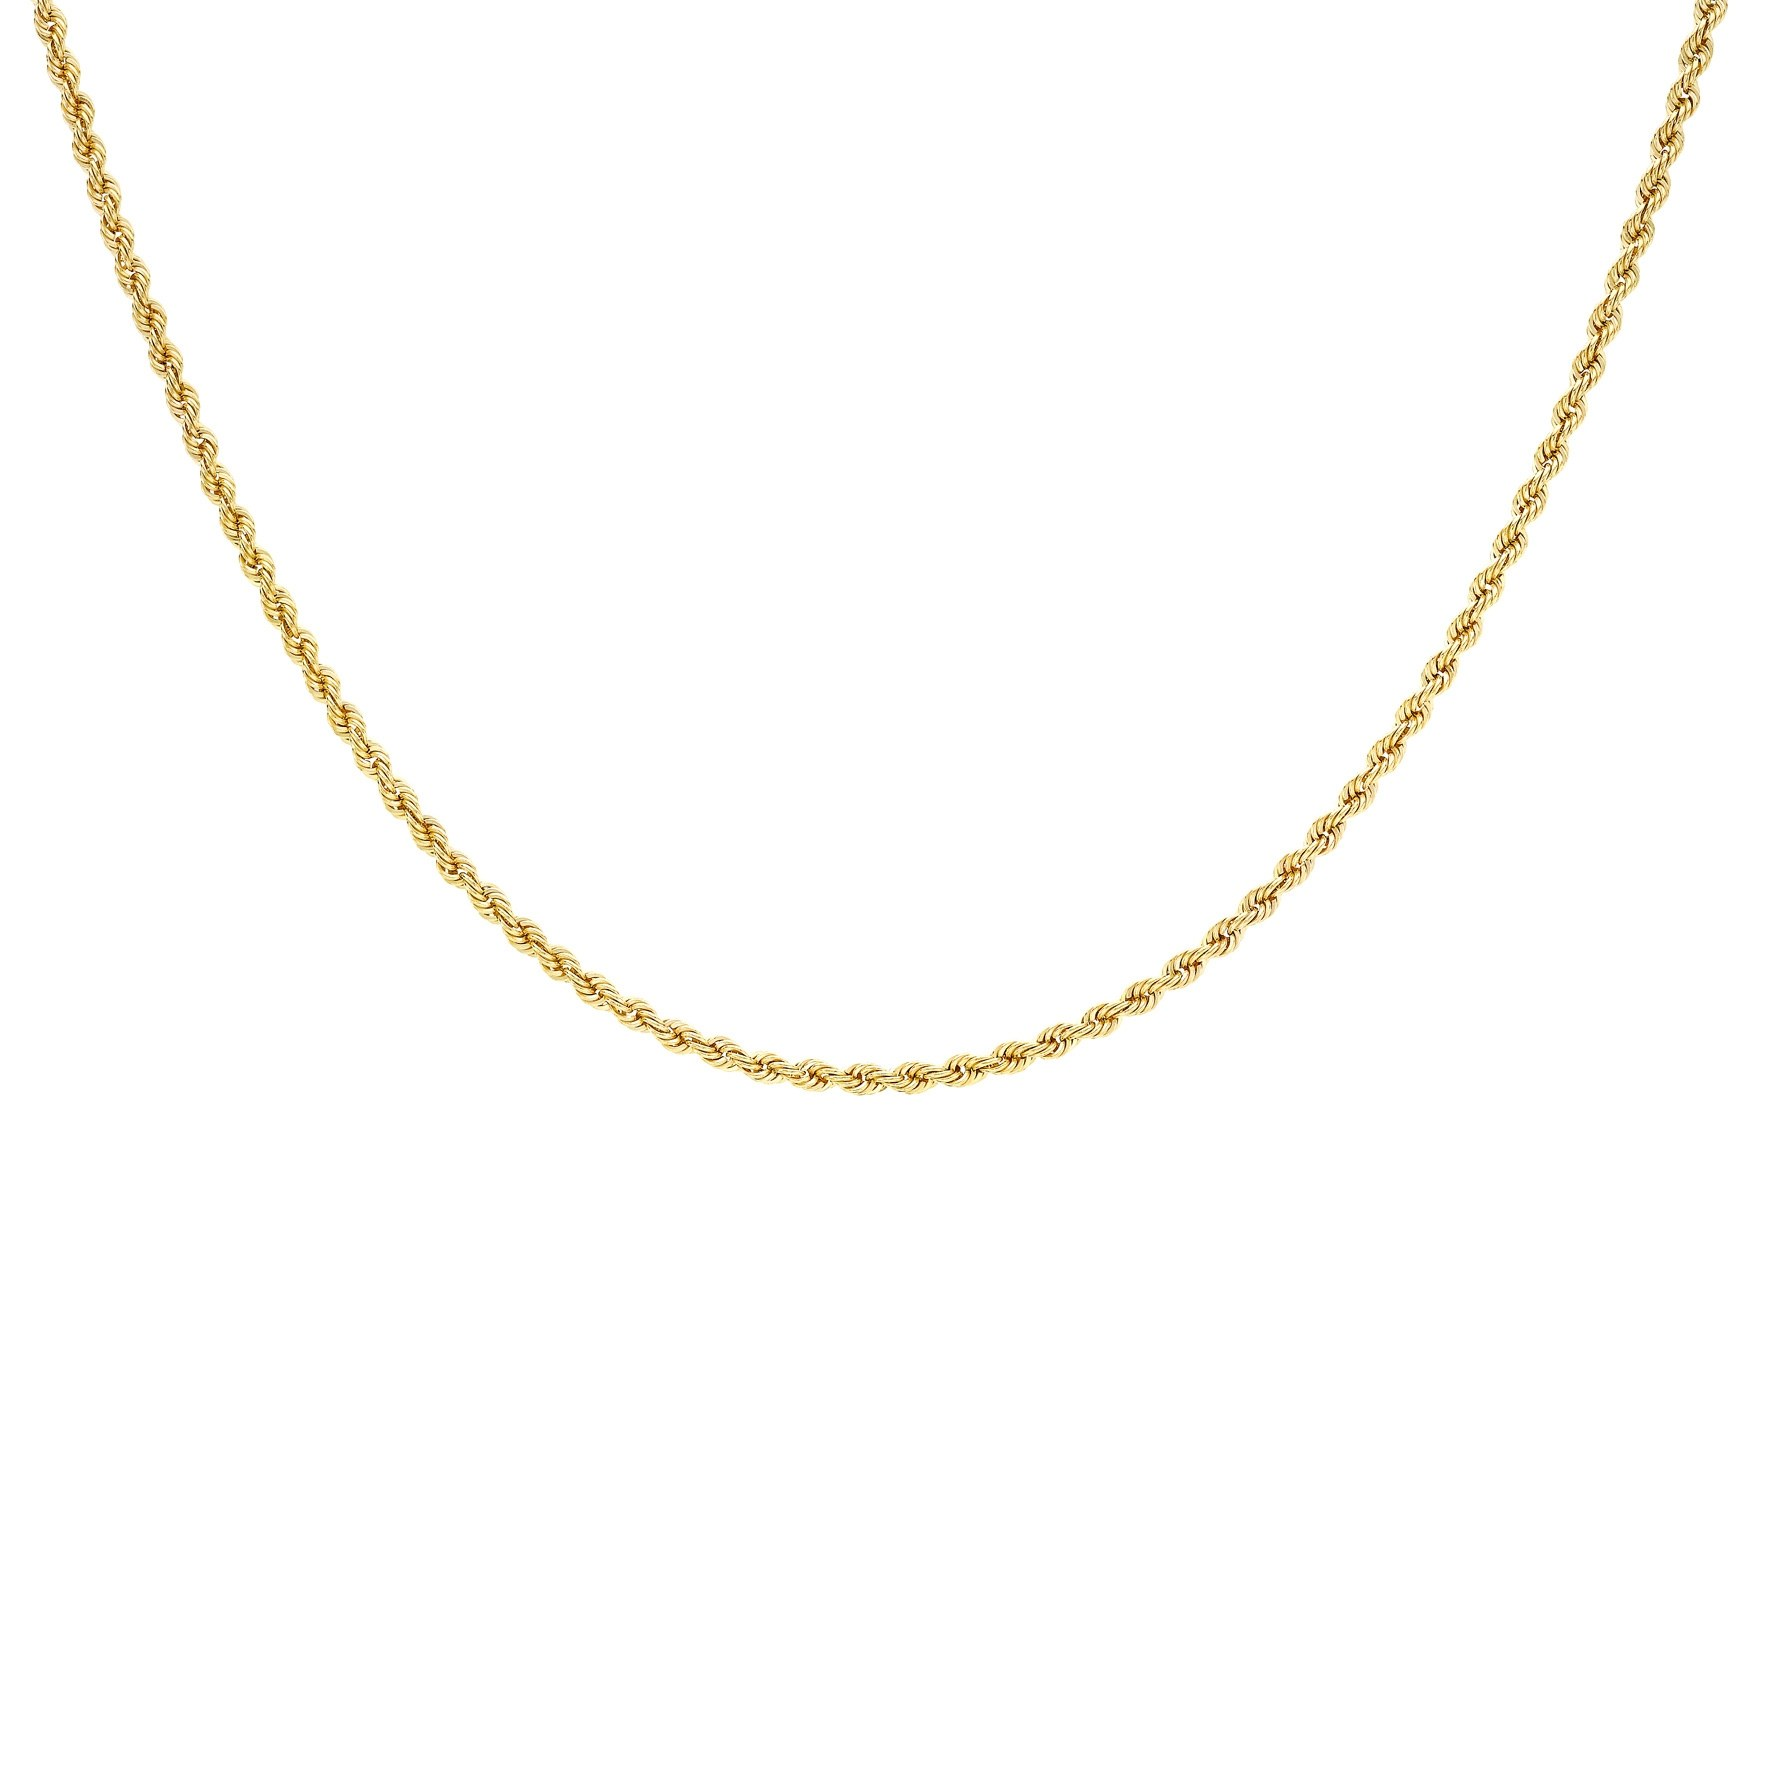 Halsband 9K Guld - Repkedja 46 cm